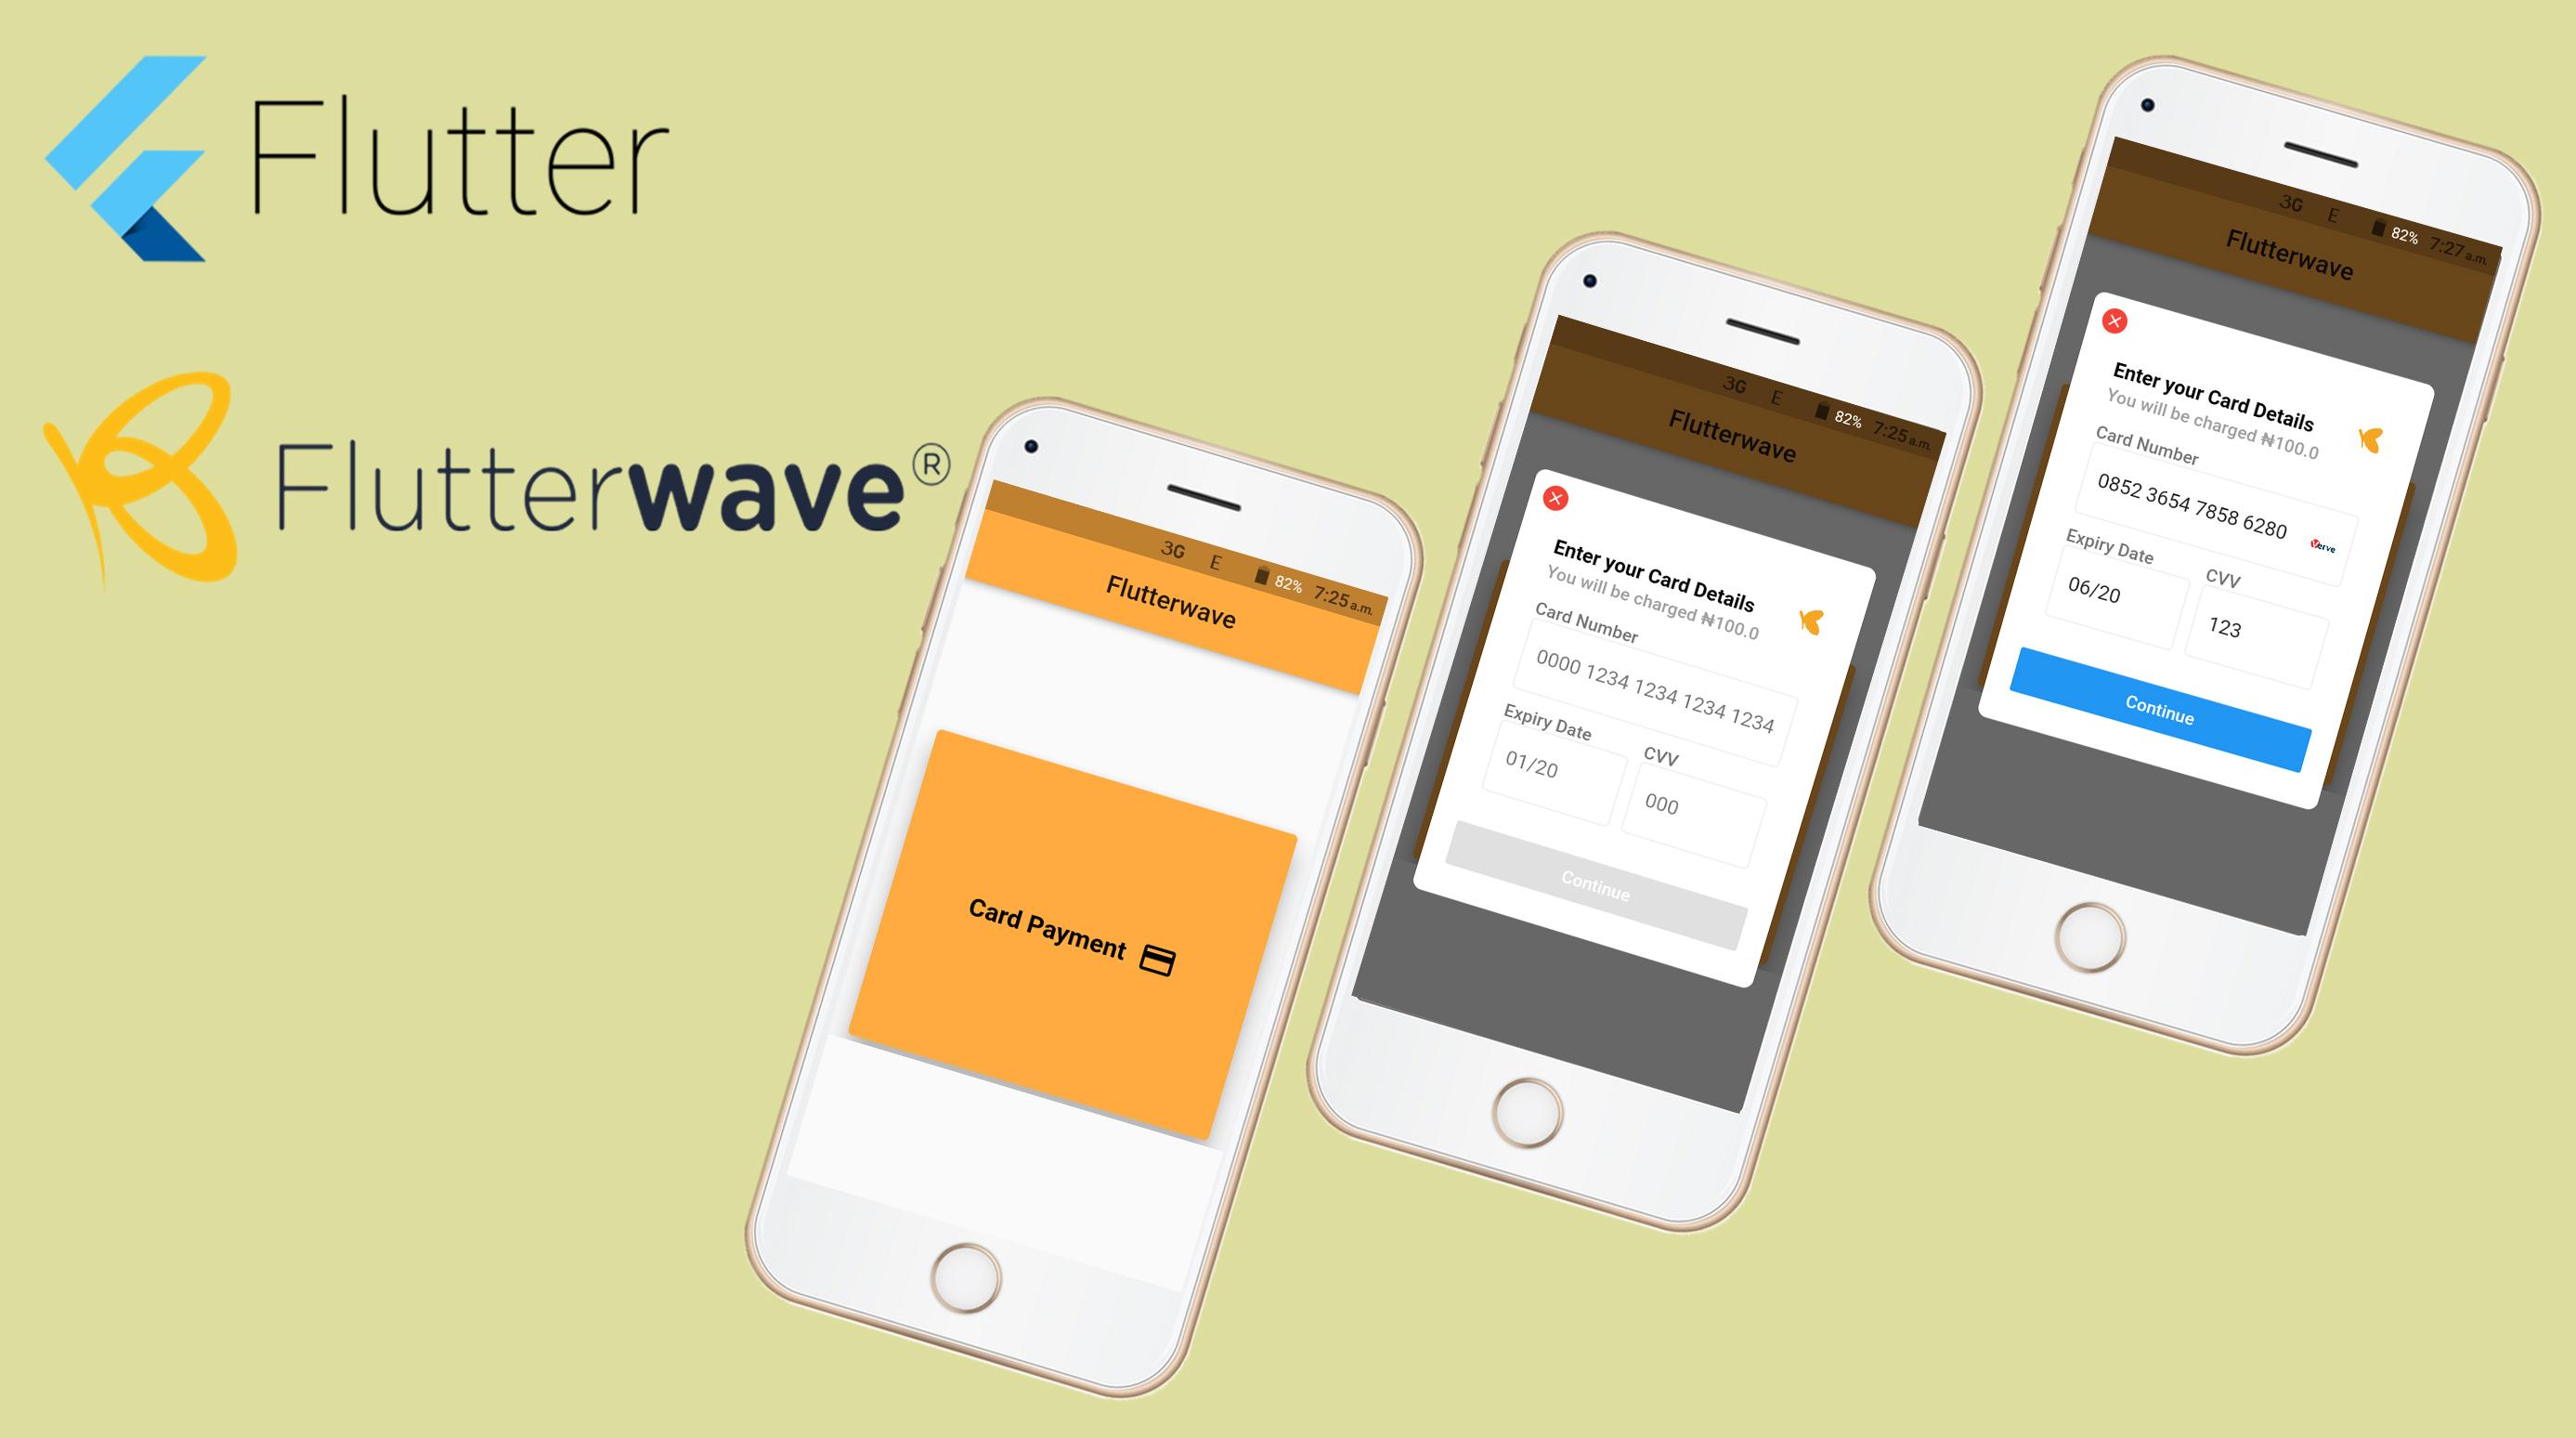 flutter with flutterwave.jpg